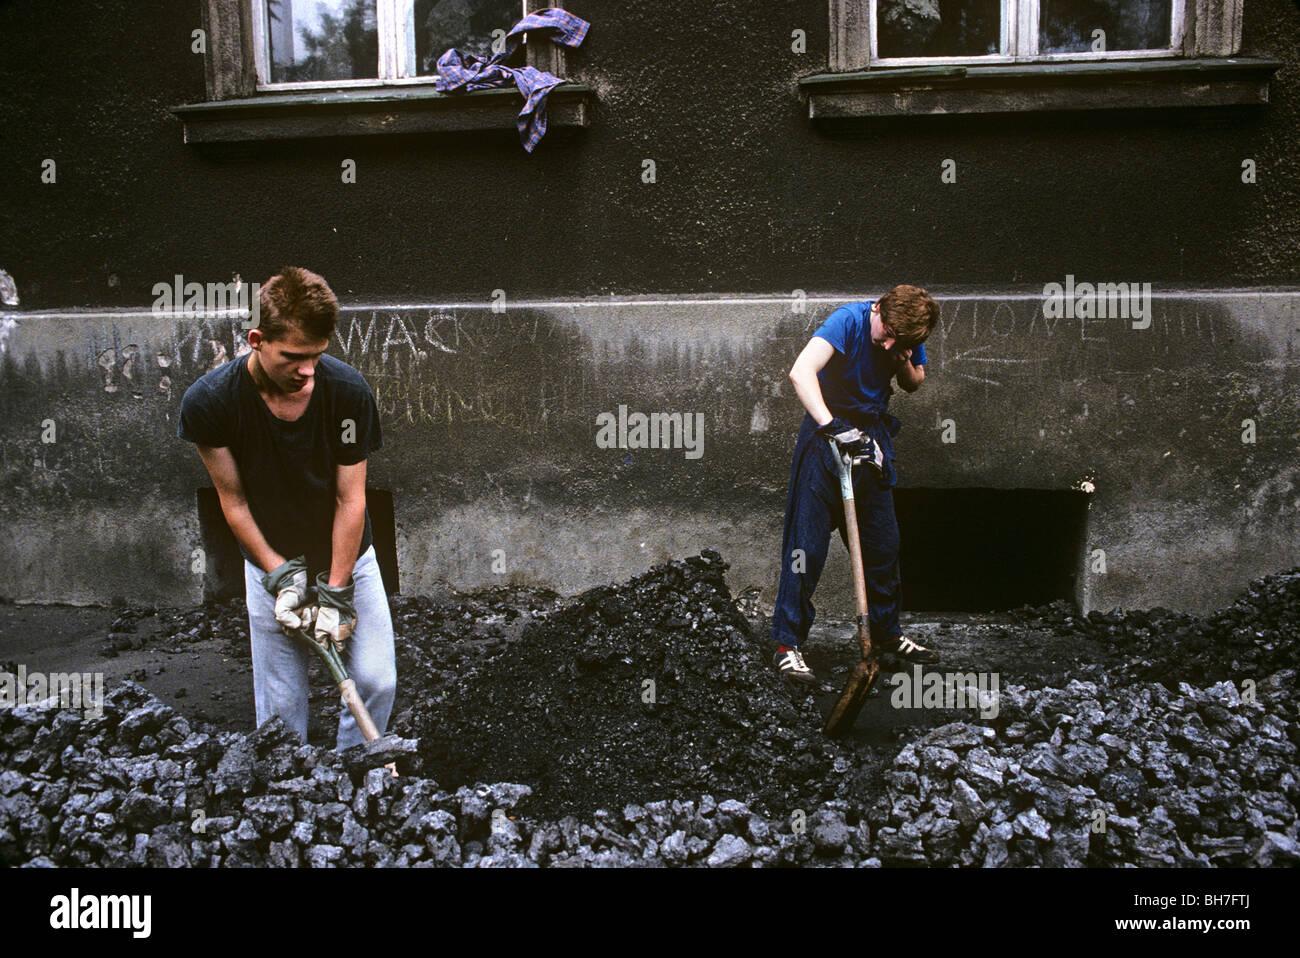 coal-delivery-men-shovel-chunks-of-brown